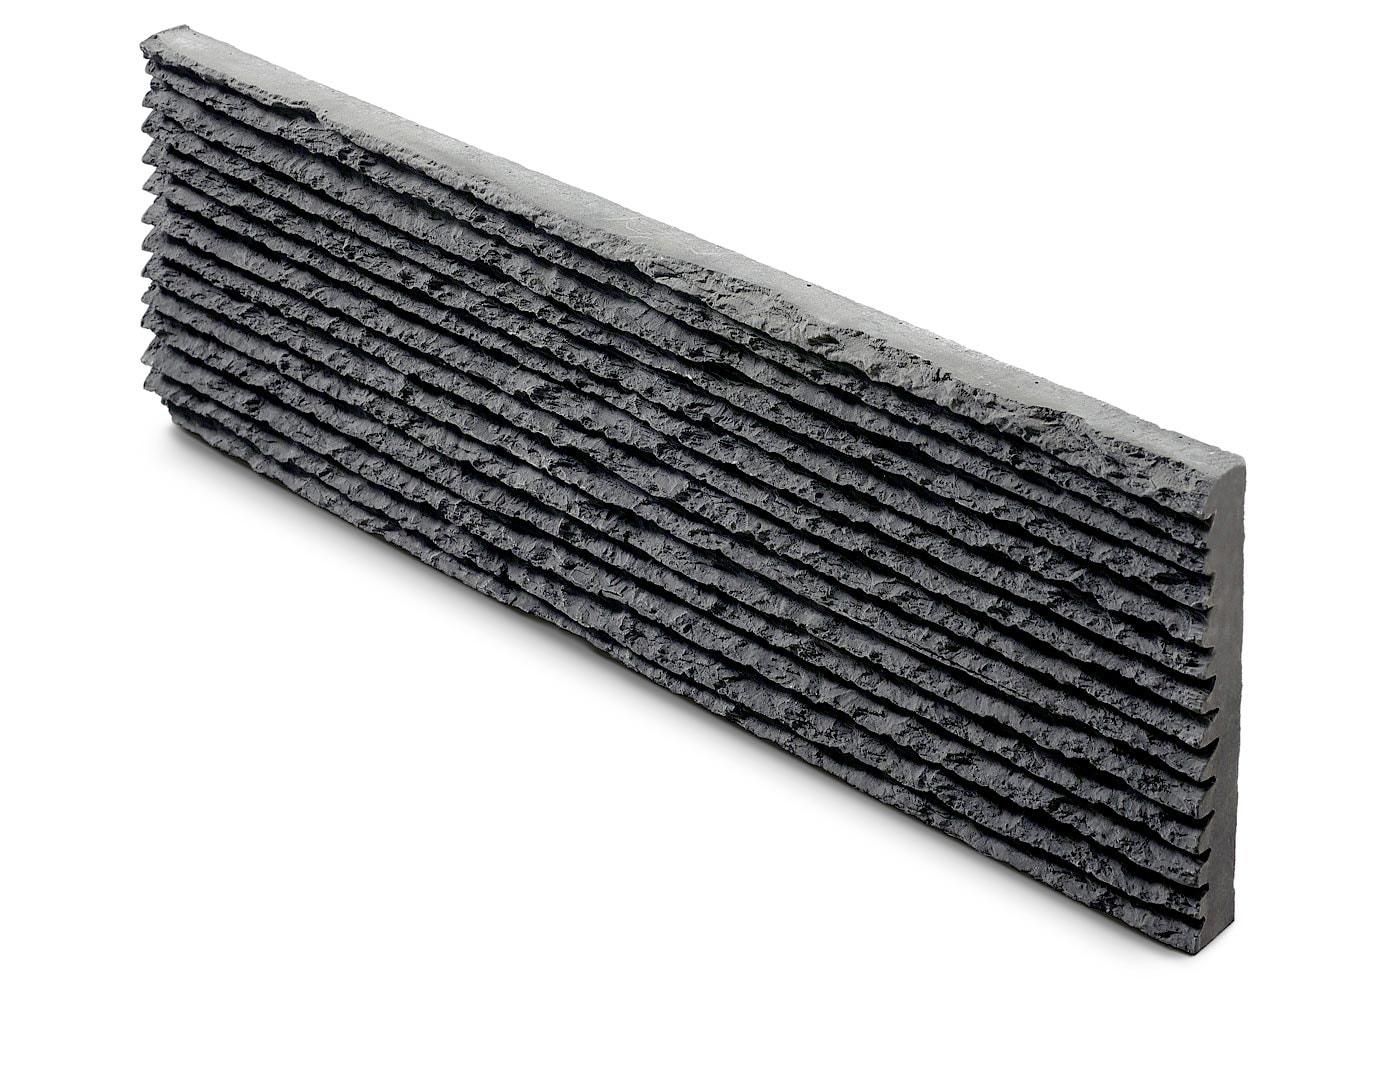 150x500 mm